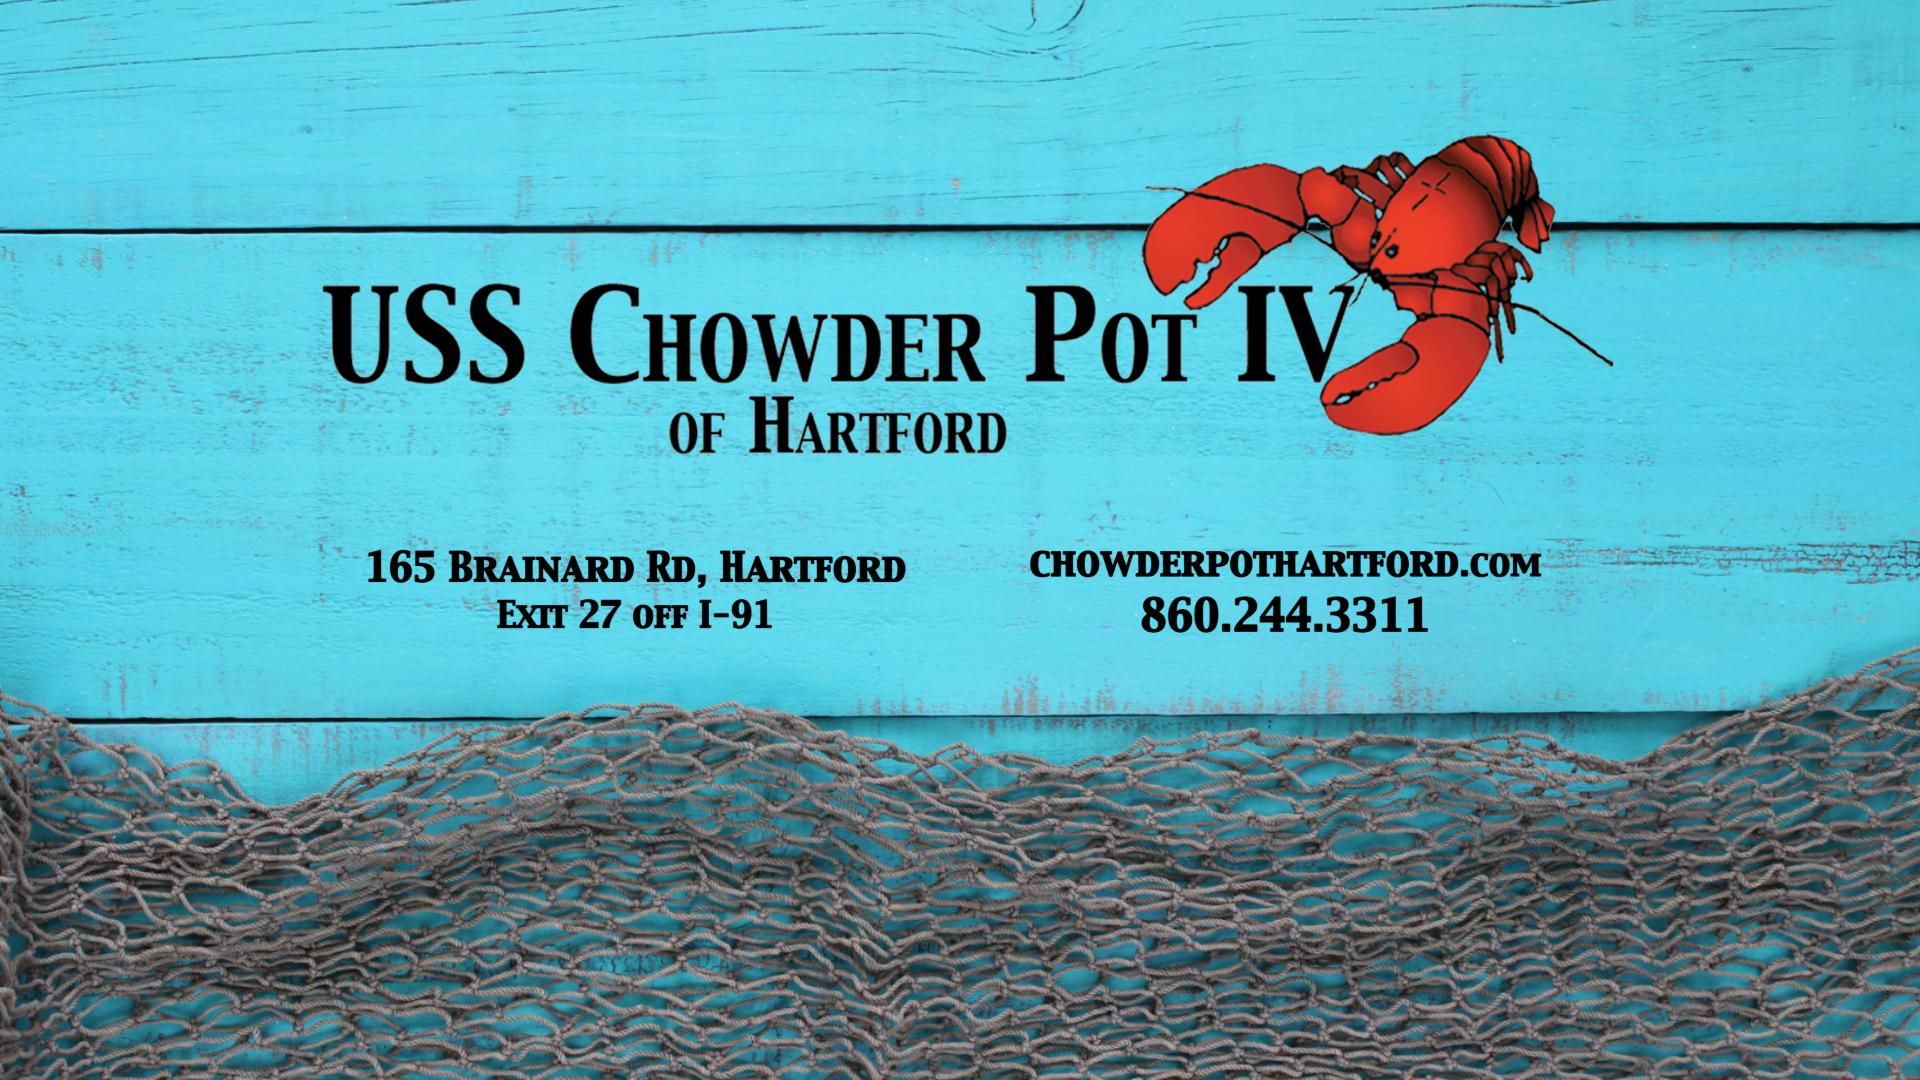 Photo at U.S.S. Chowder Pot IV